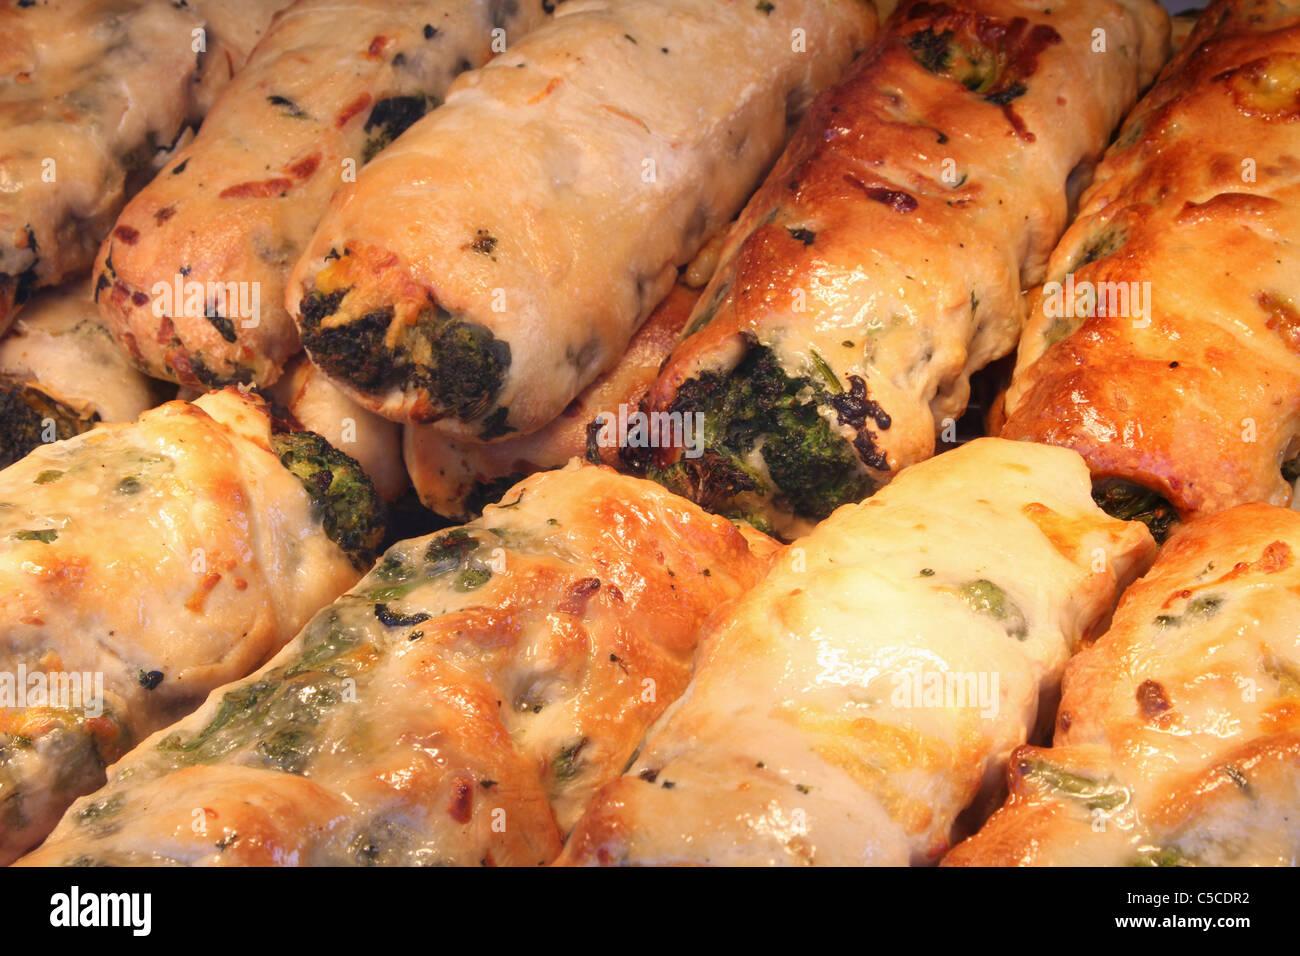 Stromboli. An Italian food. Canfield Fair. Mahoning County Fair. Canfield, Ohio, USA. Stock Photo